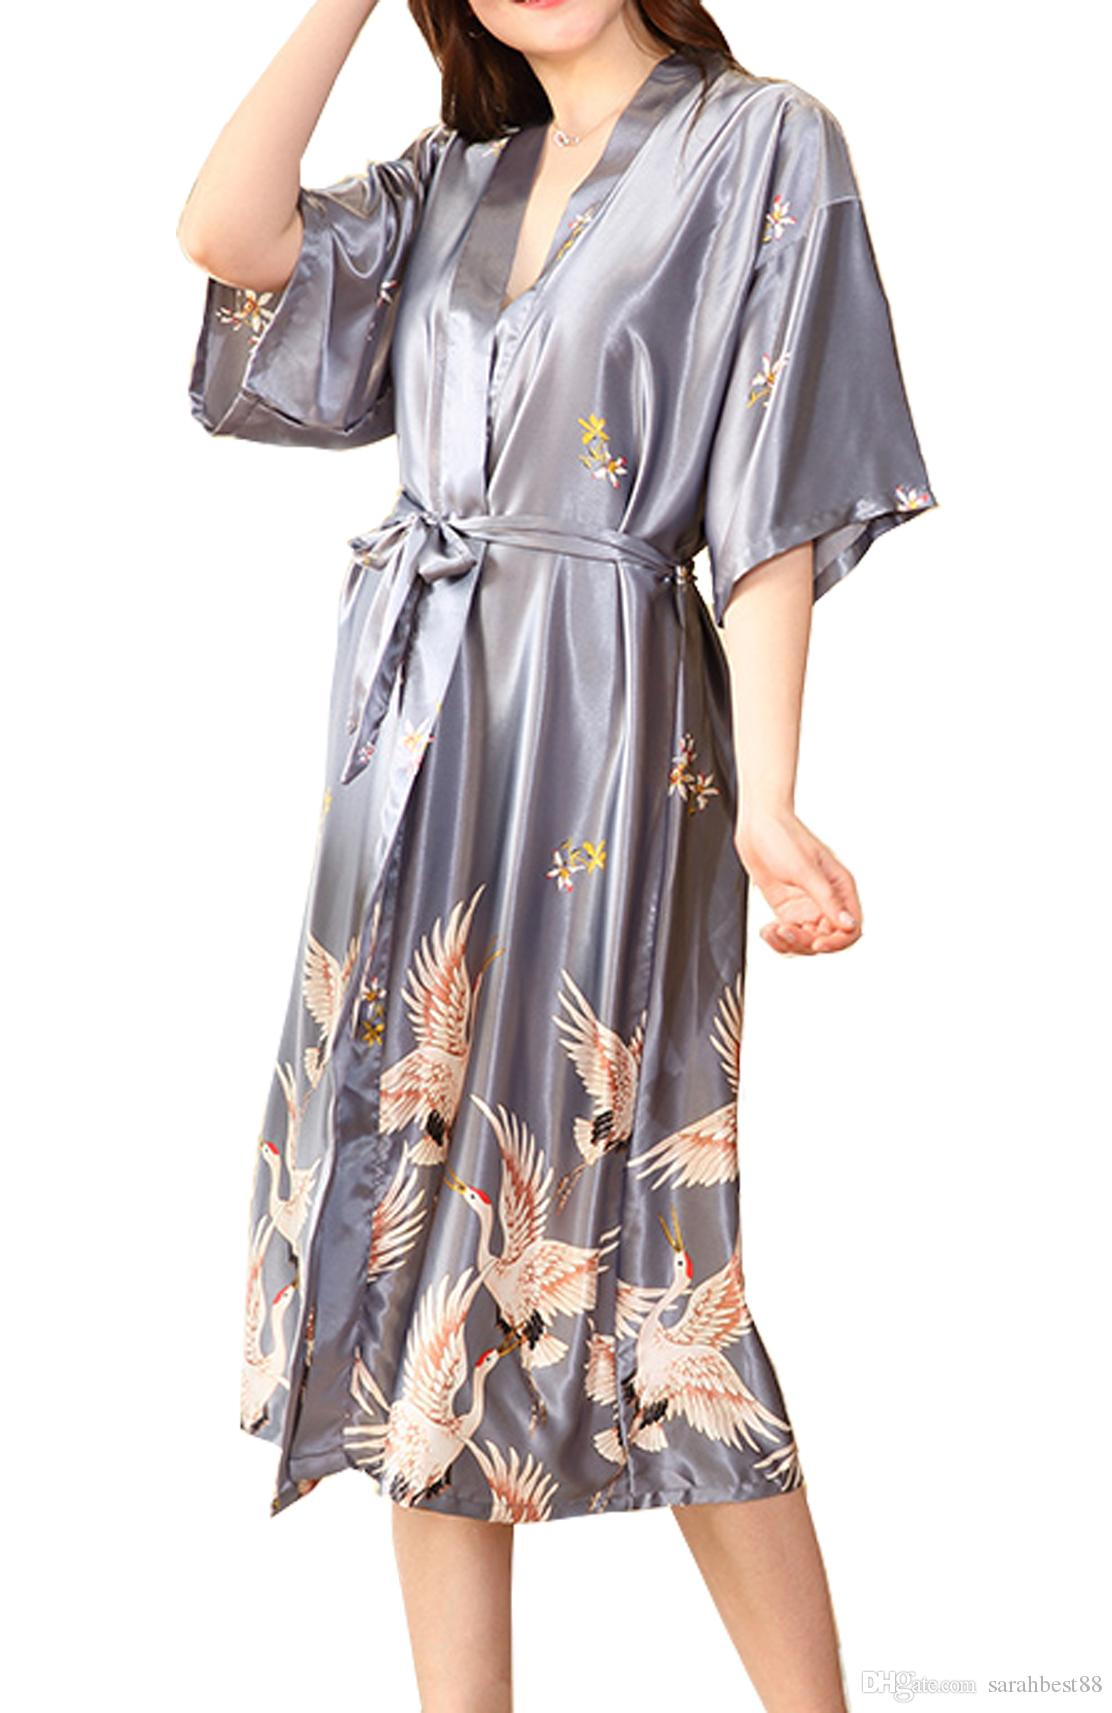 2019 Women Elegant Long Kimono Robe Satin Nightwear Wedding Bridesmaids  Dressing Gown Loungewear Ladies V Neck Half Sleeve Nightdress With Belt  From ... 33f004e56